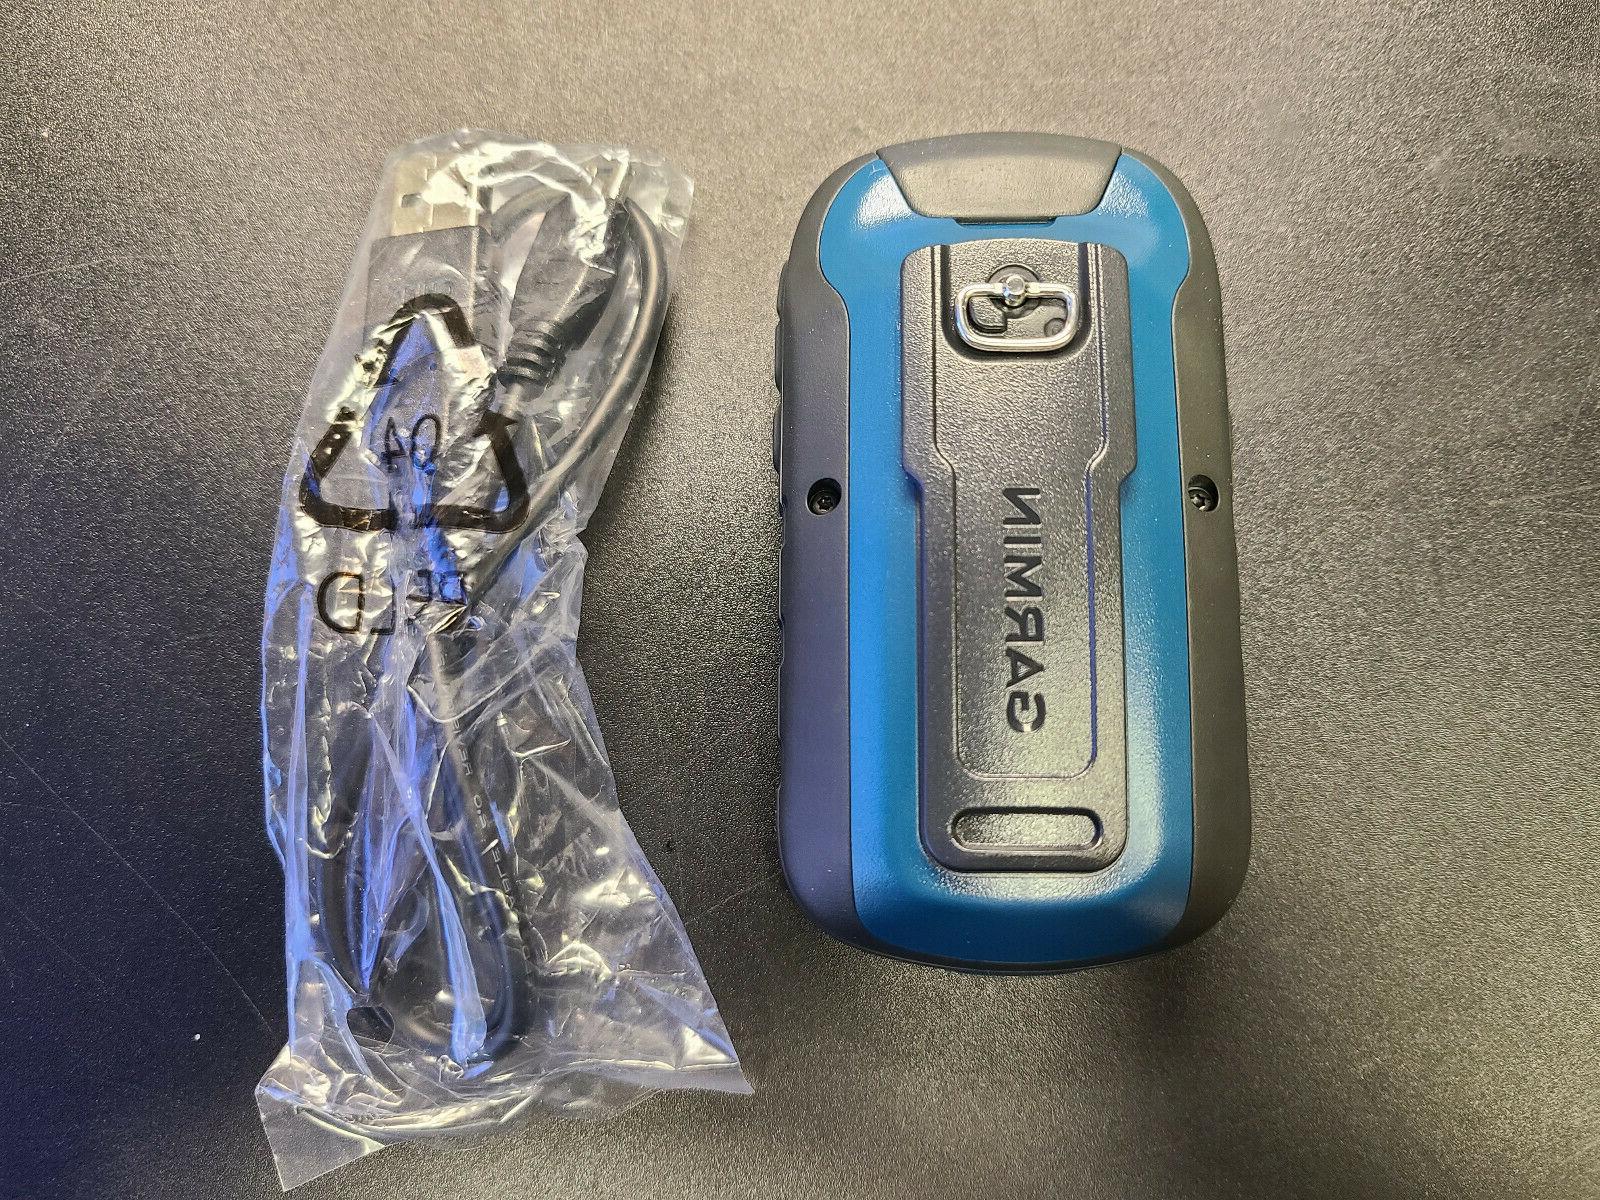 New Garmin Rugged Outdoor Handheld GPS 010-02256-00 + More